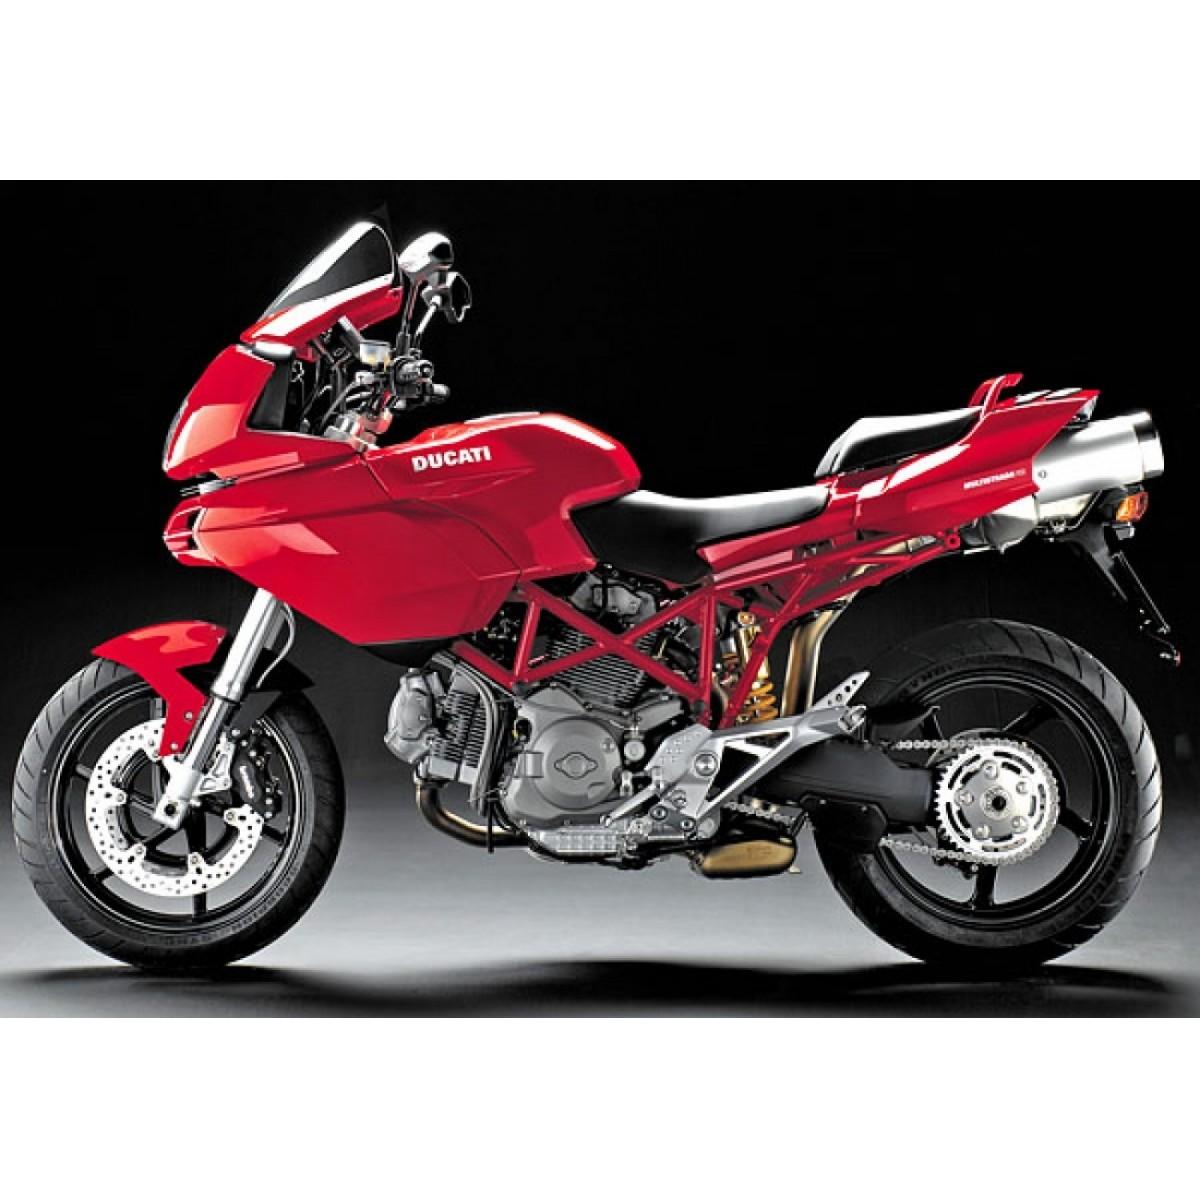 Kit Adesivos Ducati Multistrada 620 Dctmu62002